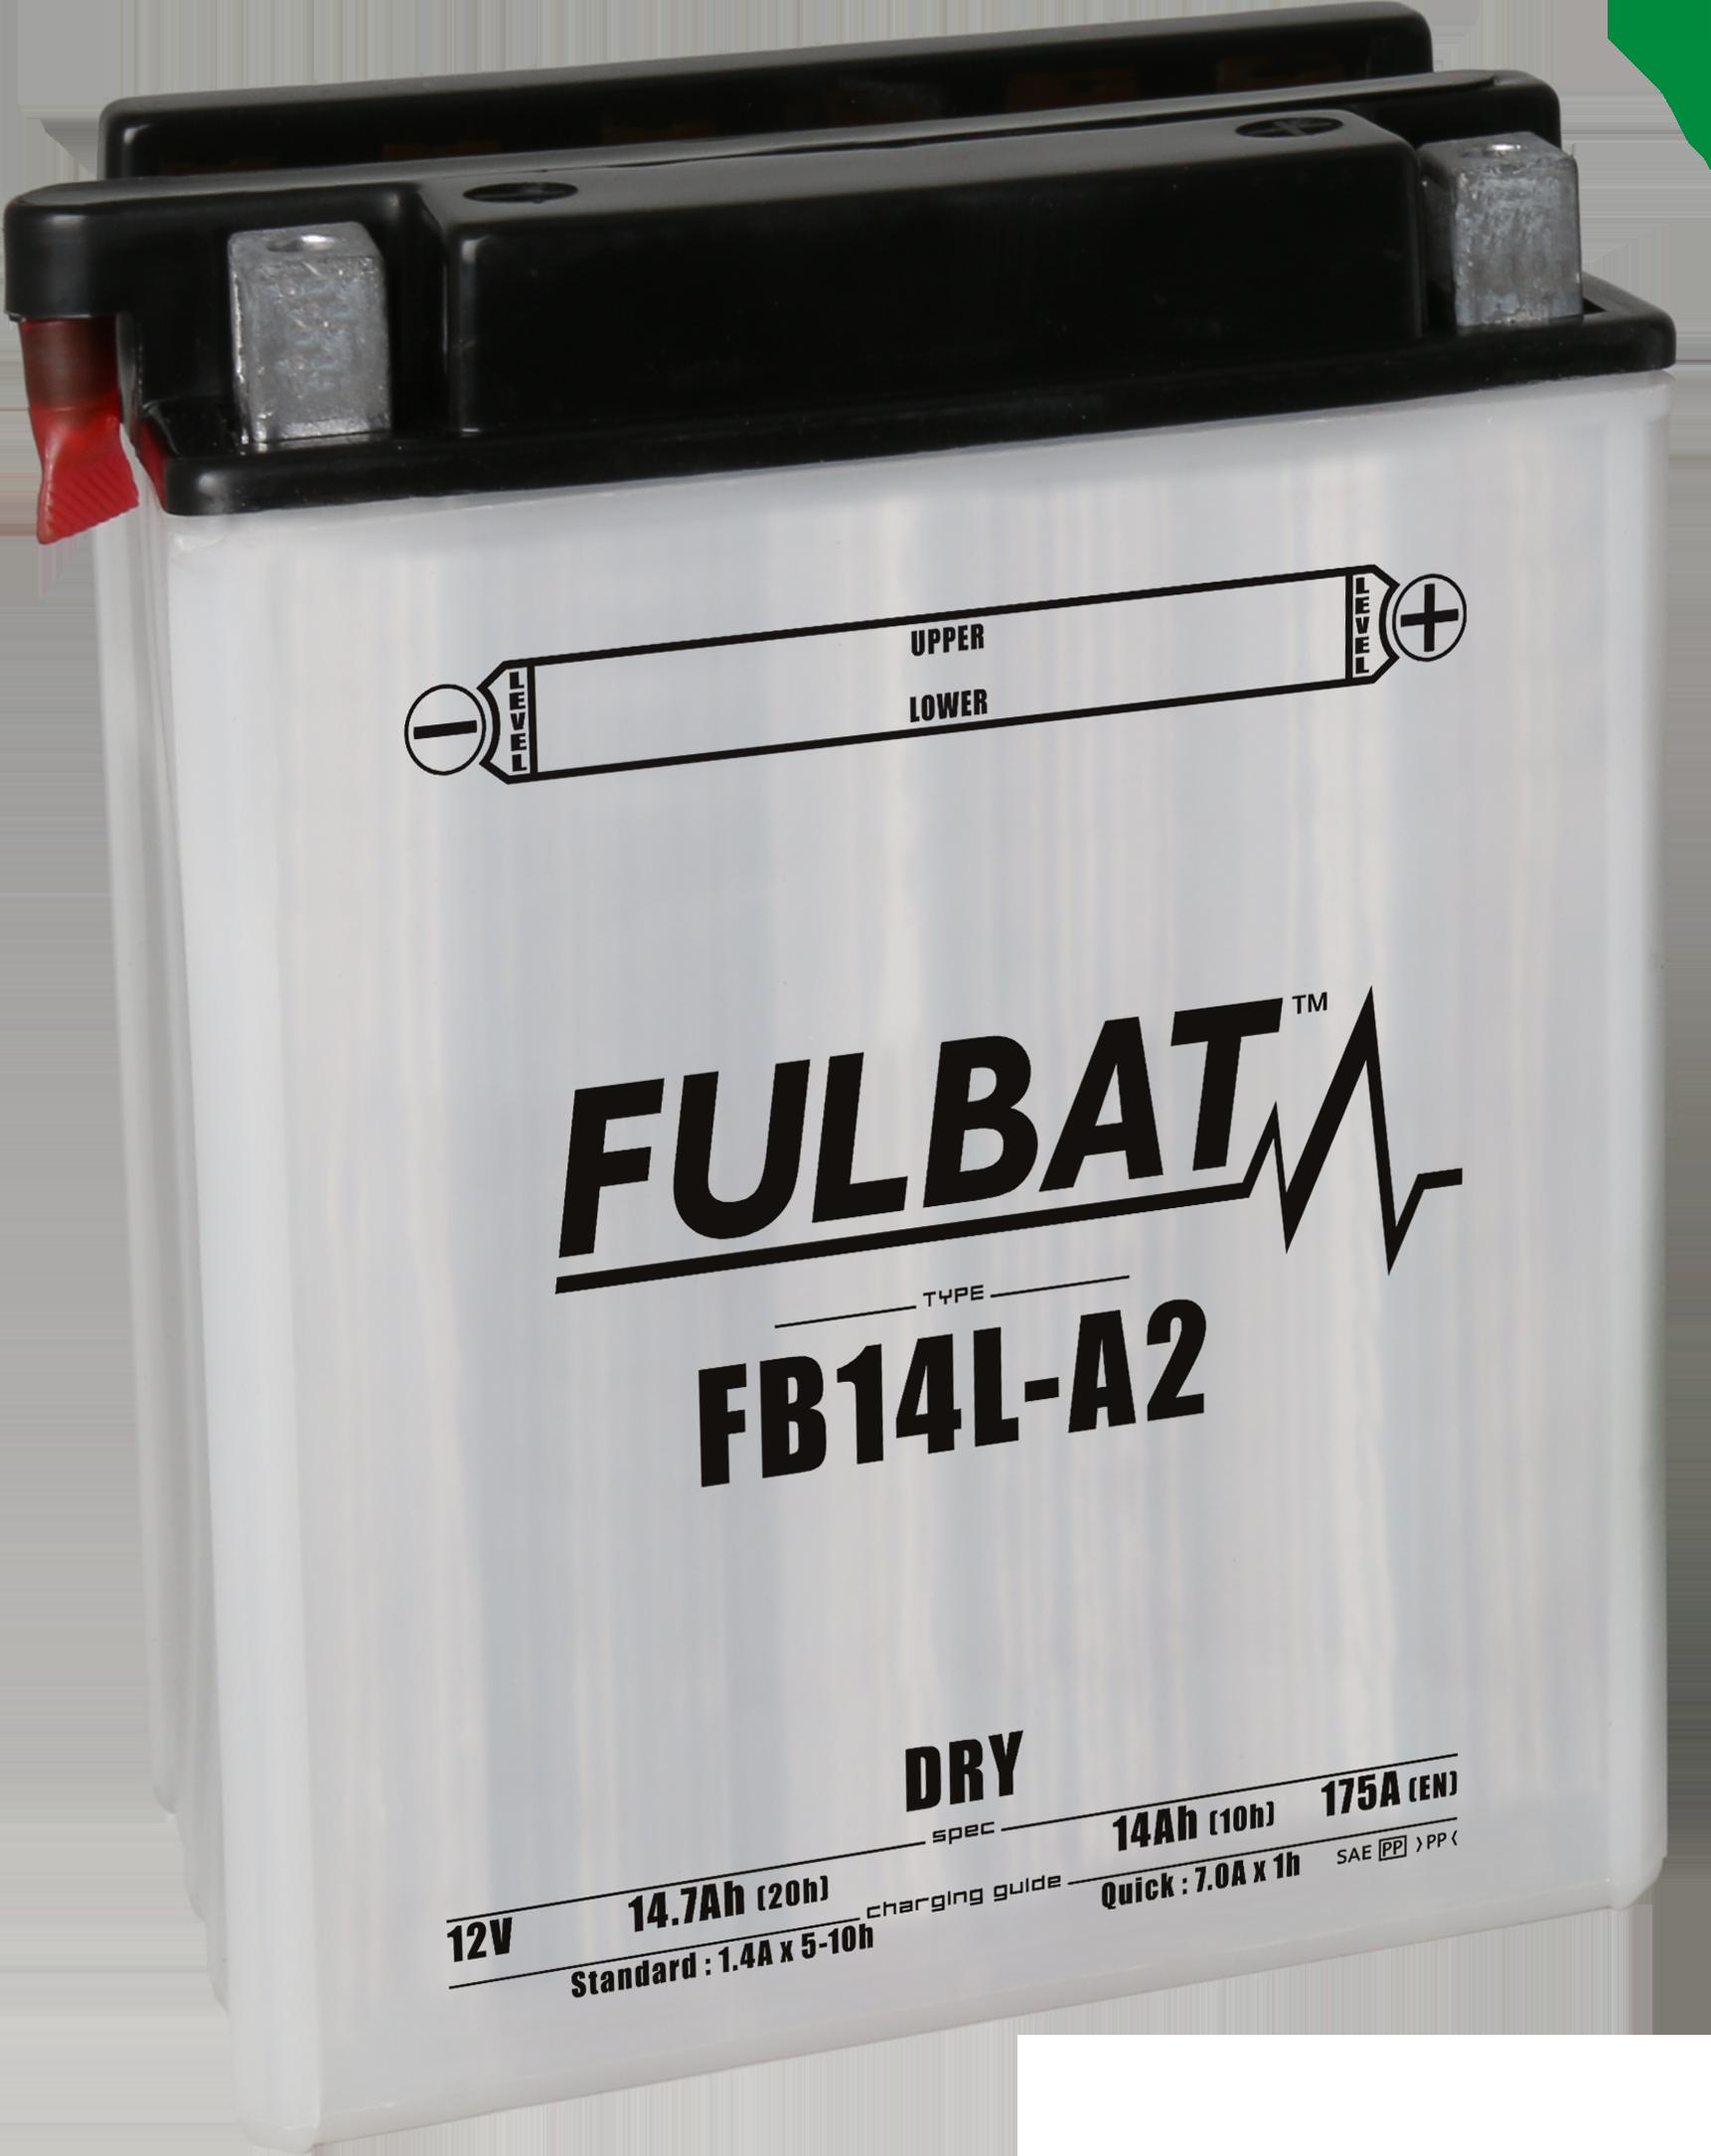 Fulbat_DRY_battery_FB14L-A2